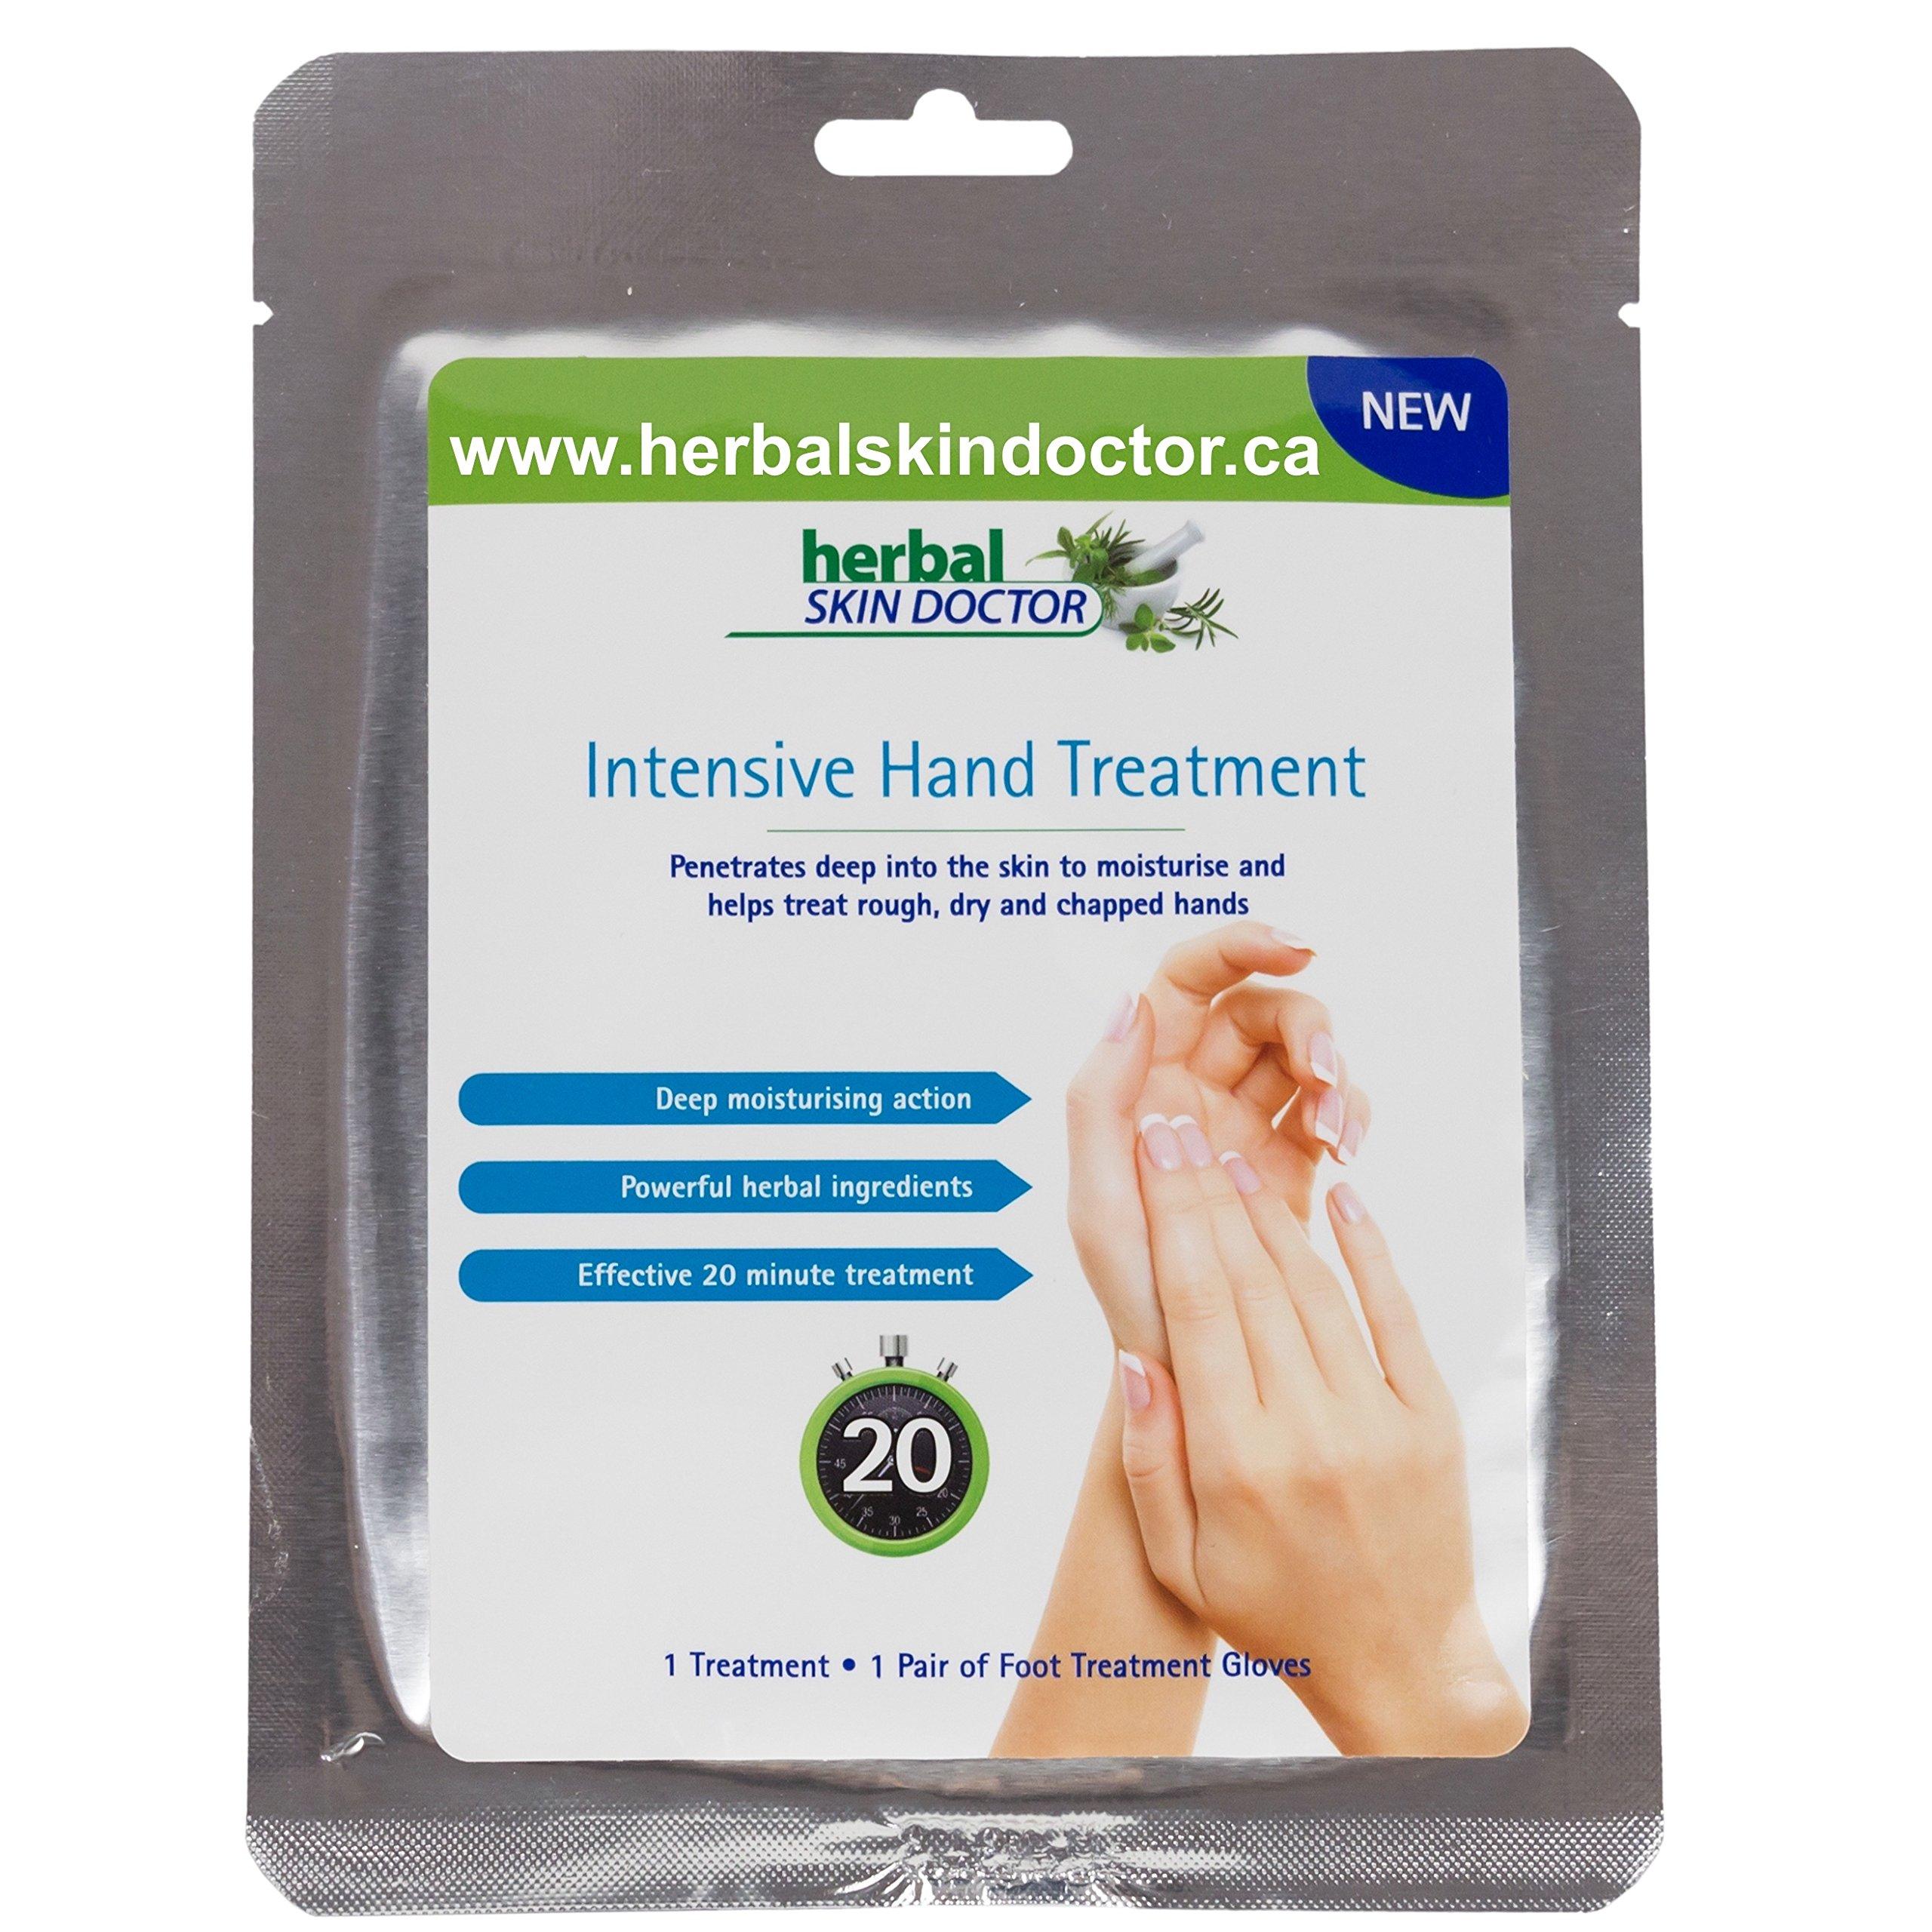 Intensive Hand Treatment, hand glove, hand mask